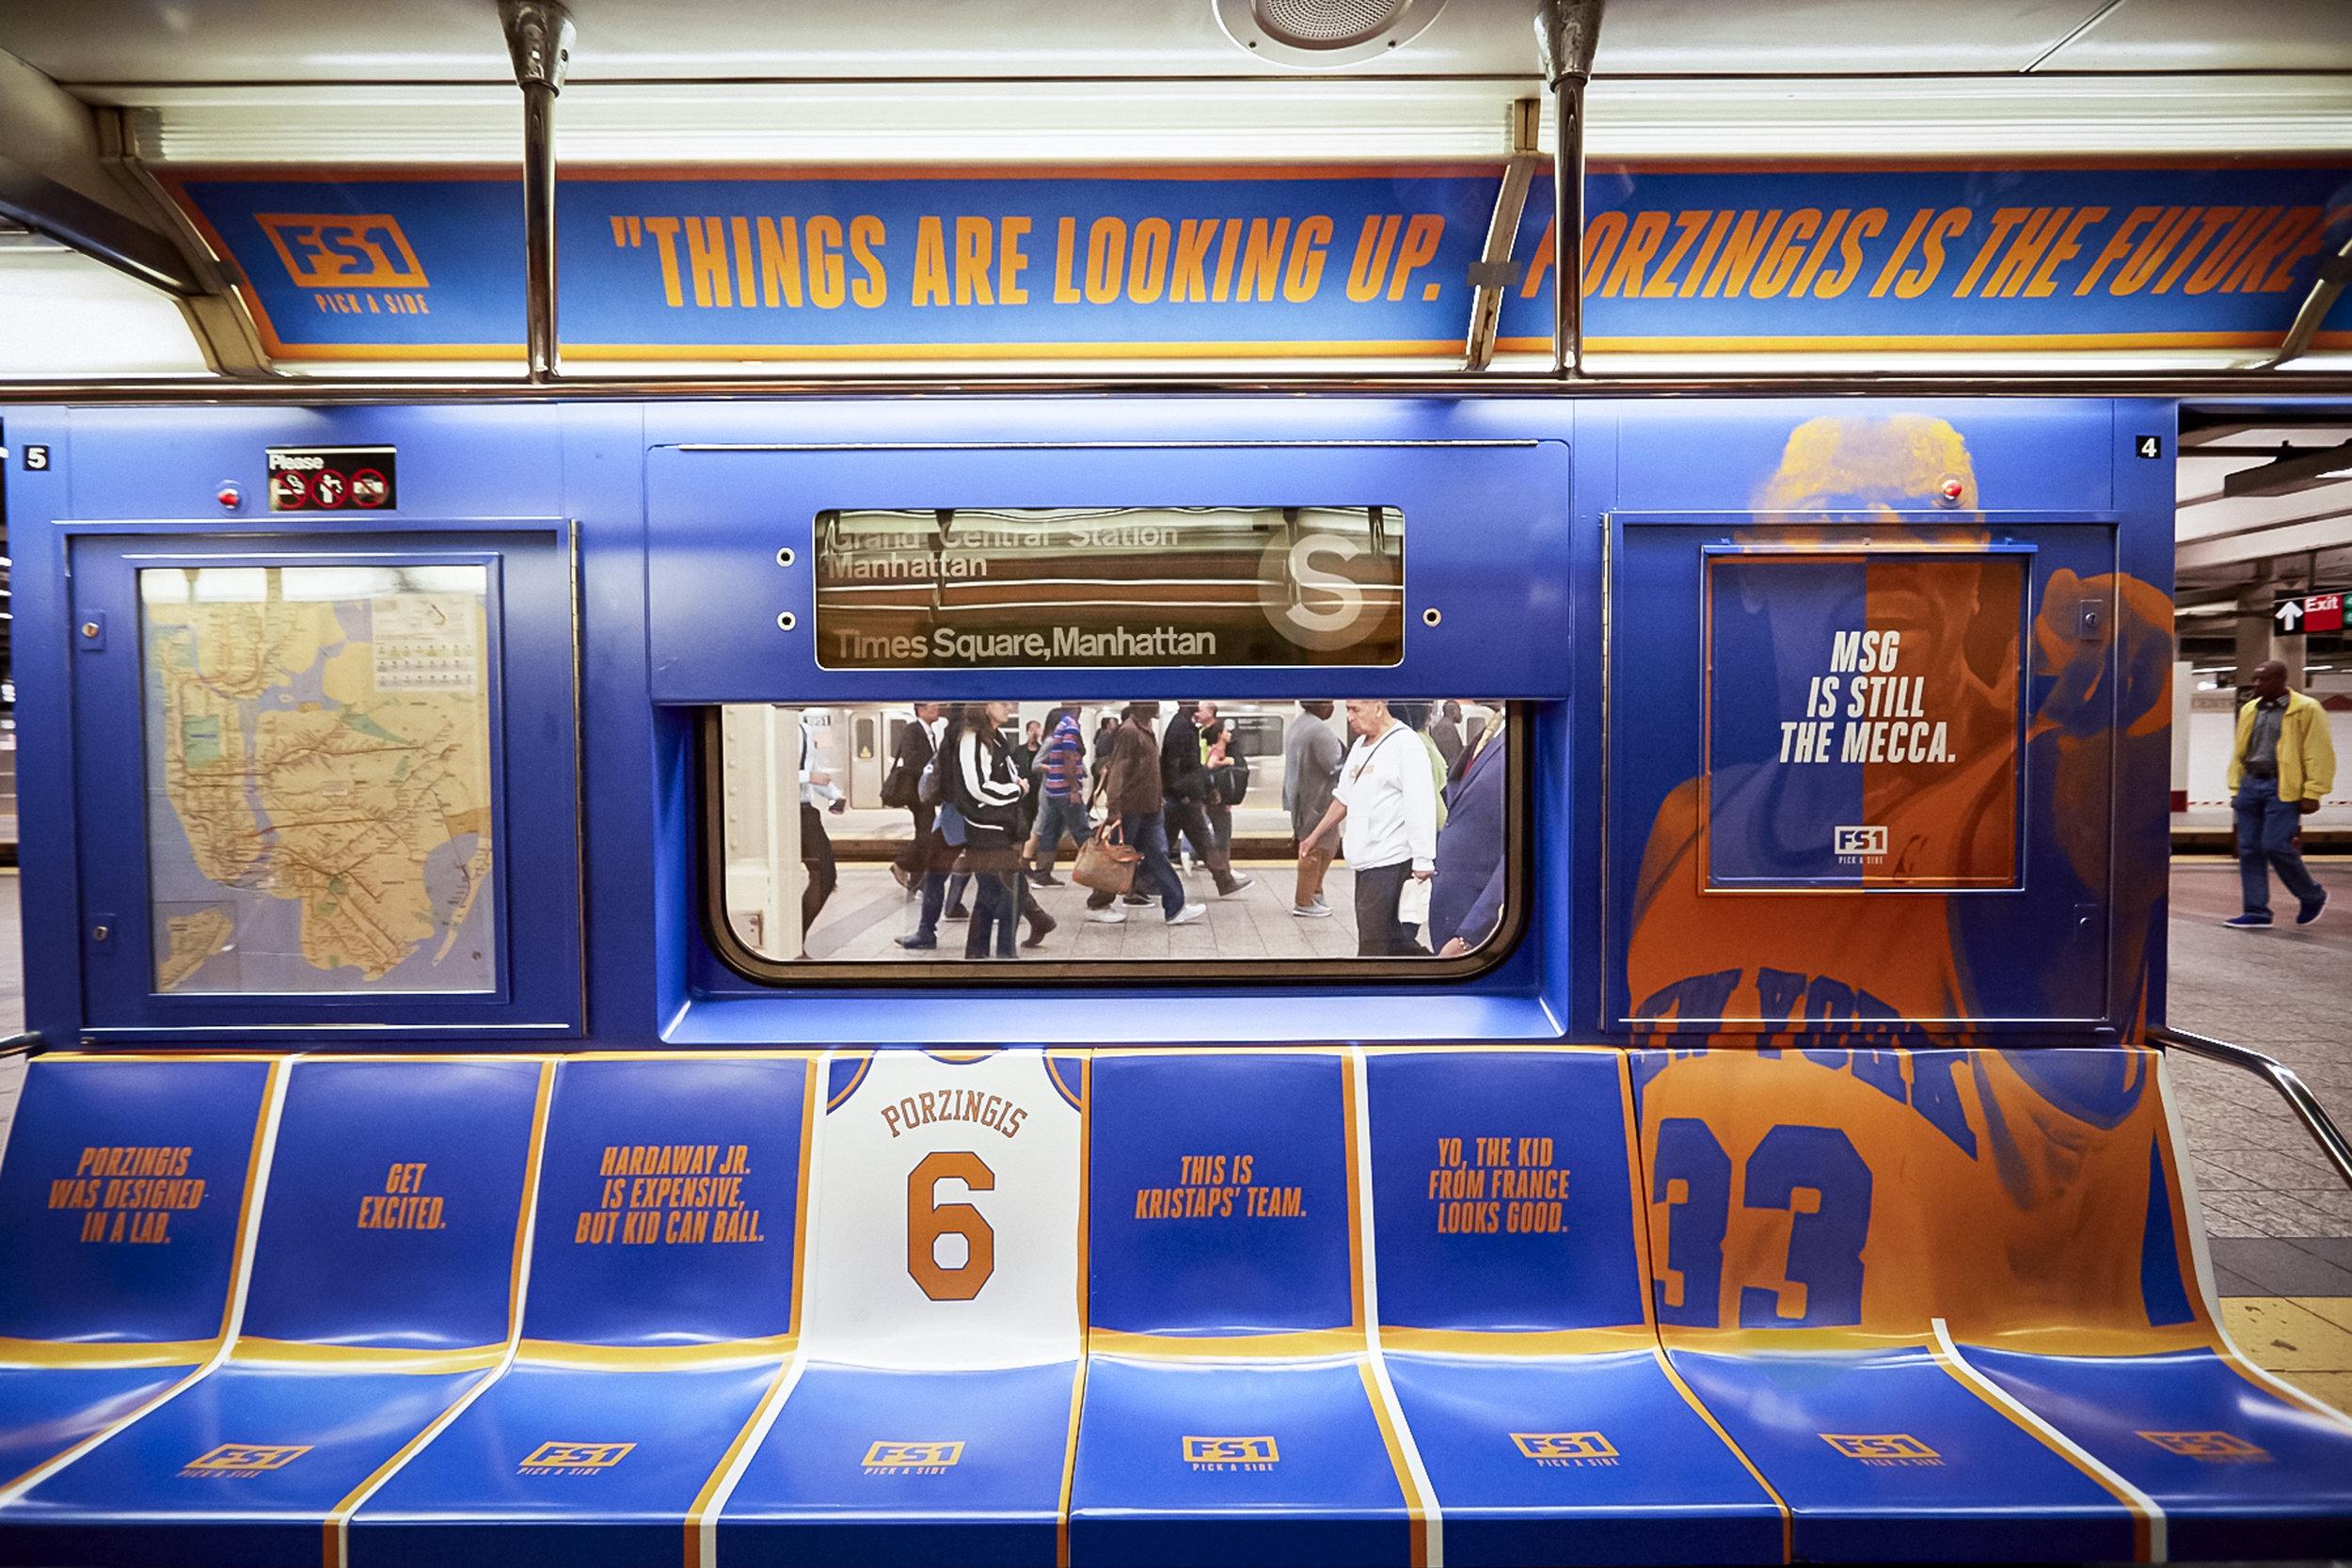 FS1_subway_shots_05.jpg